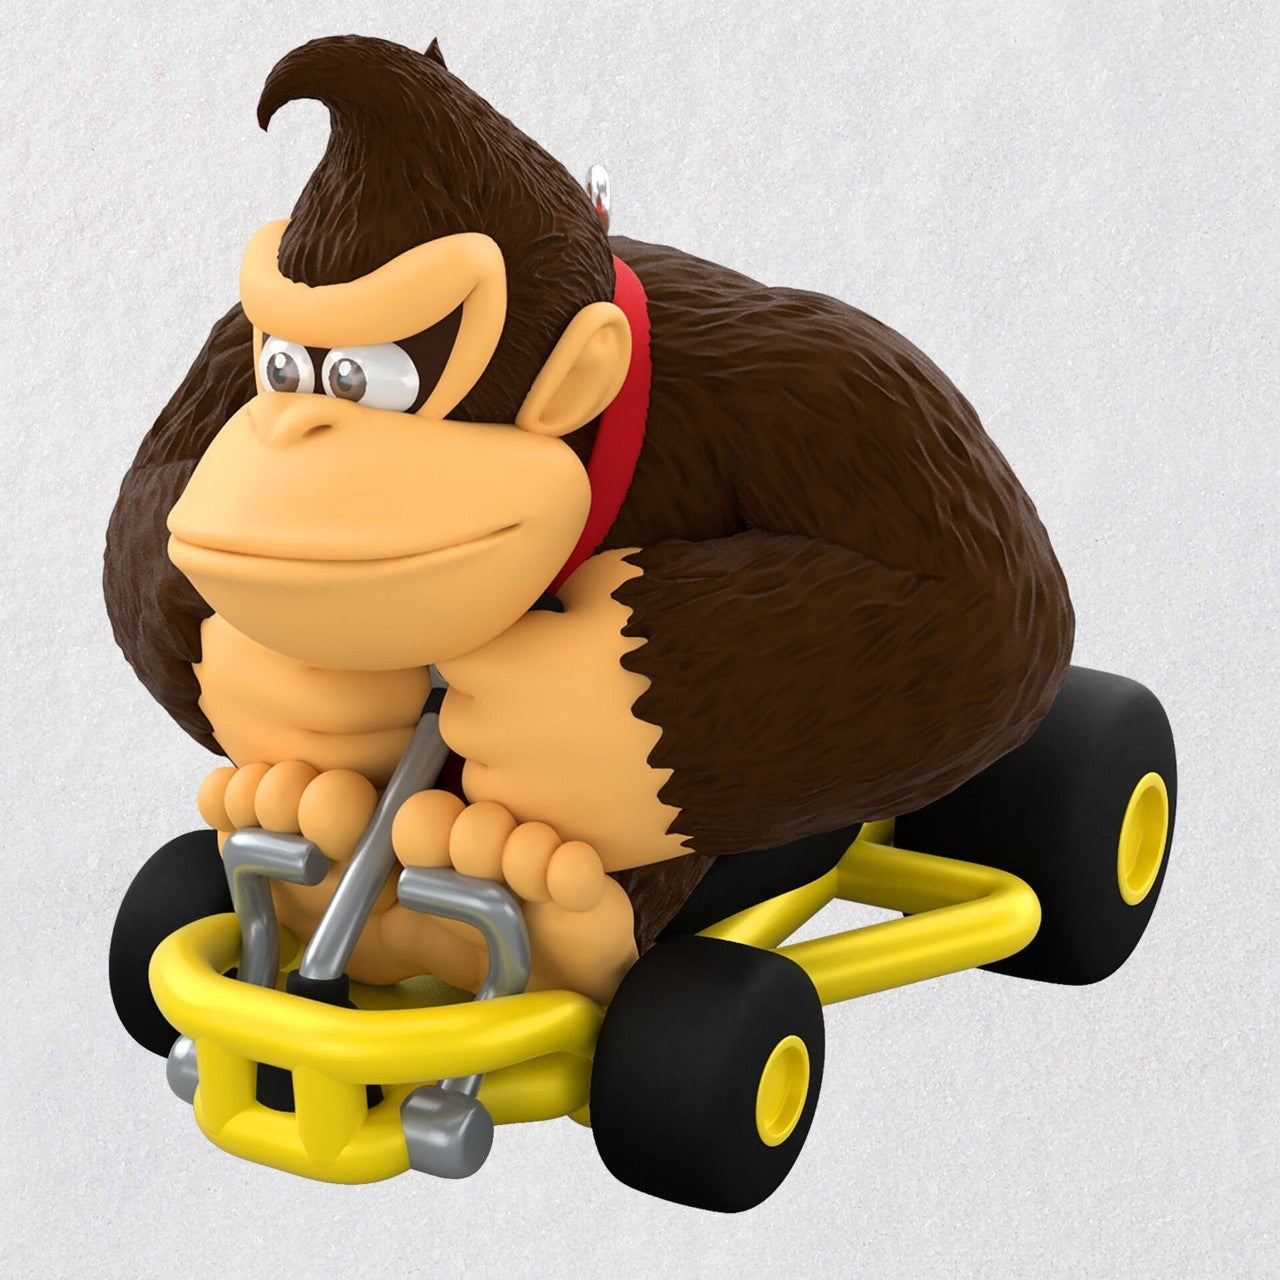 Nintendo-Mario-Kart-Donkey-Kong-Keepsake-Ornament_1899QXI7452_01